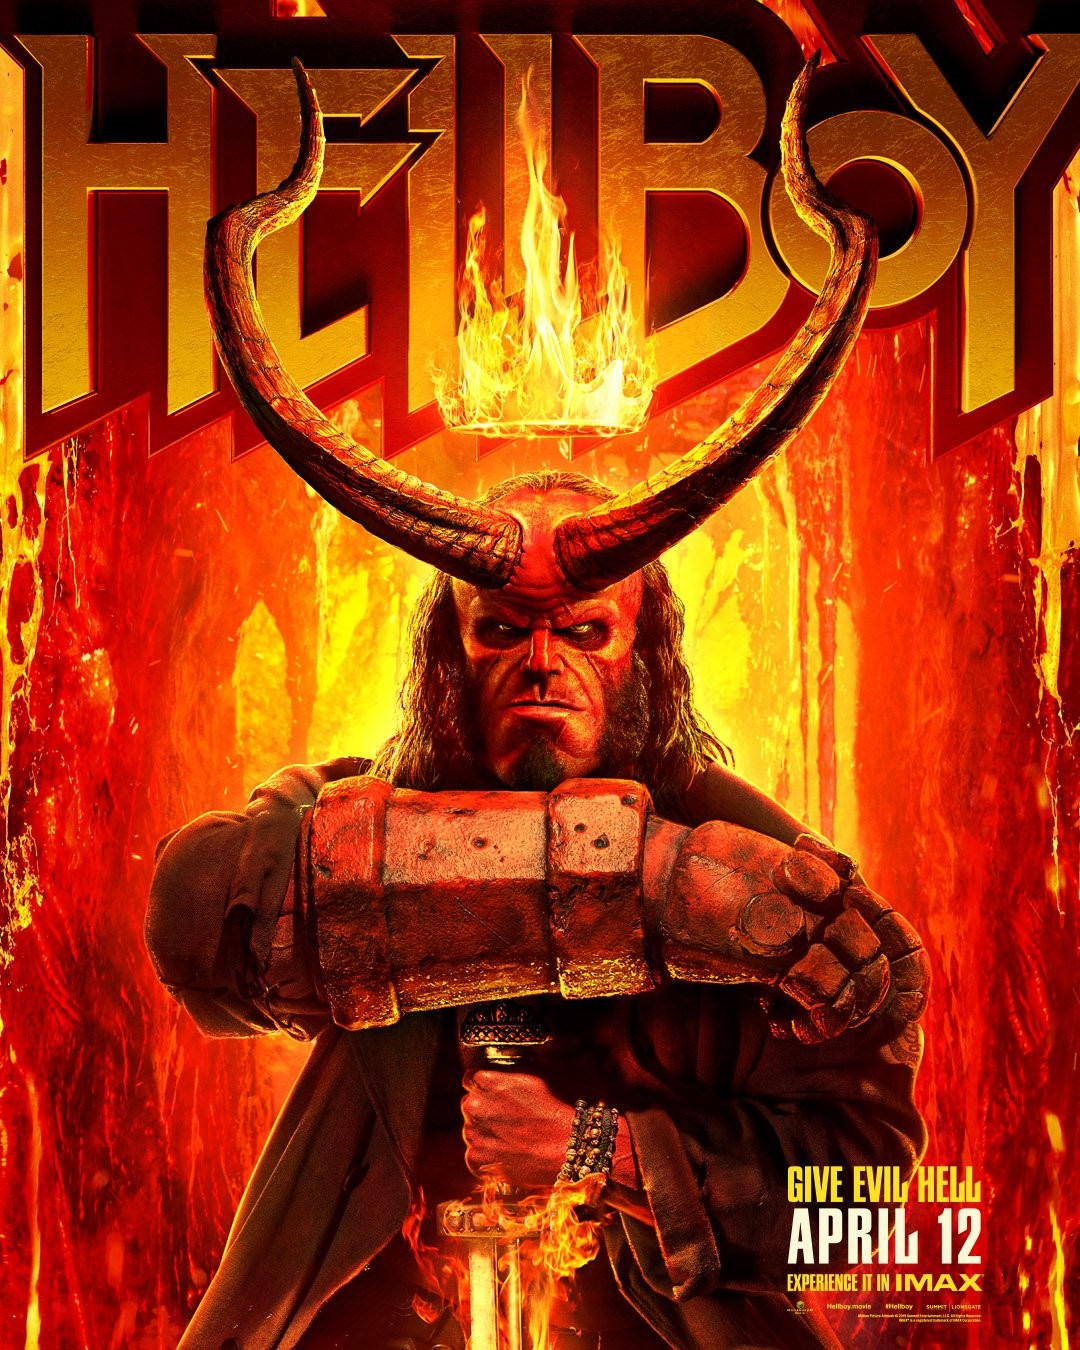 David Harbour's 'Hellboy' Gets a Second Trailer milla jocovich ian mcshane guillermo del toro lionsgate comic comicbook superhero red devil guy with huge arm